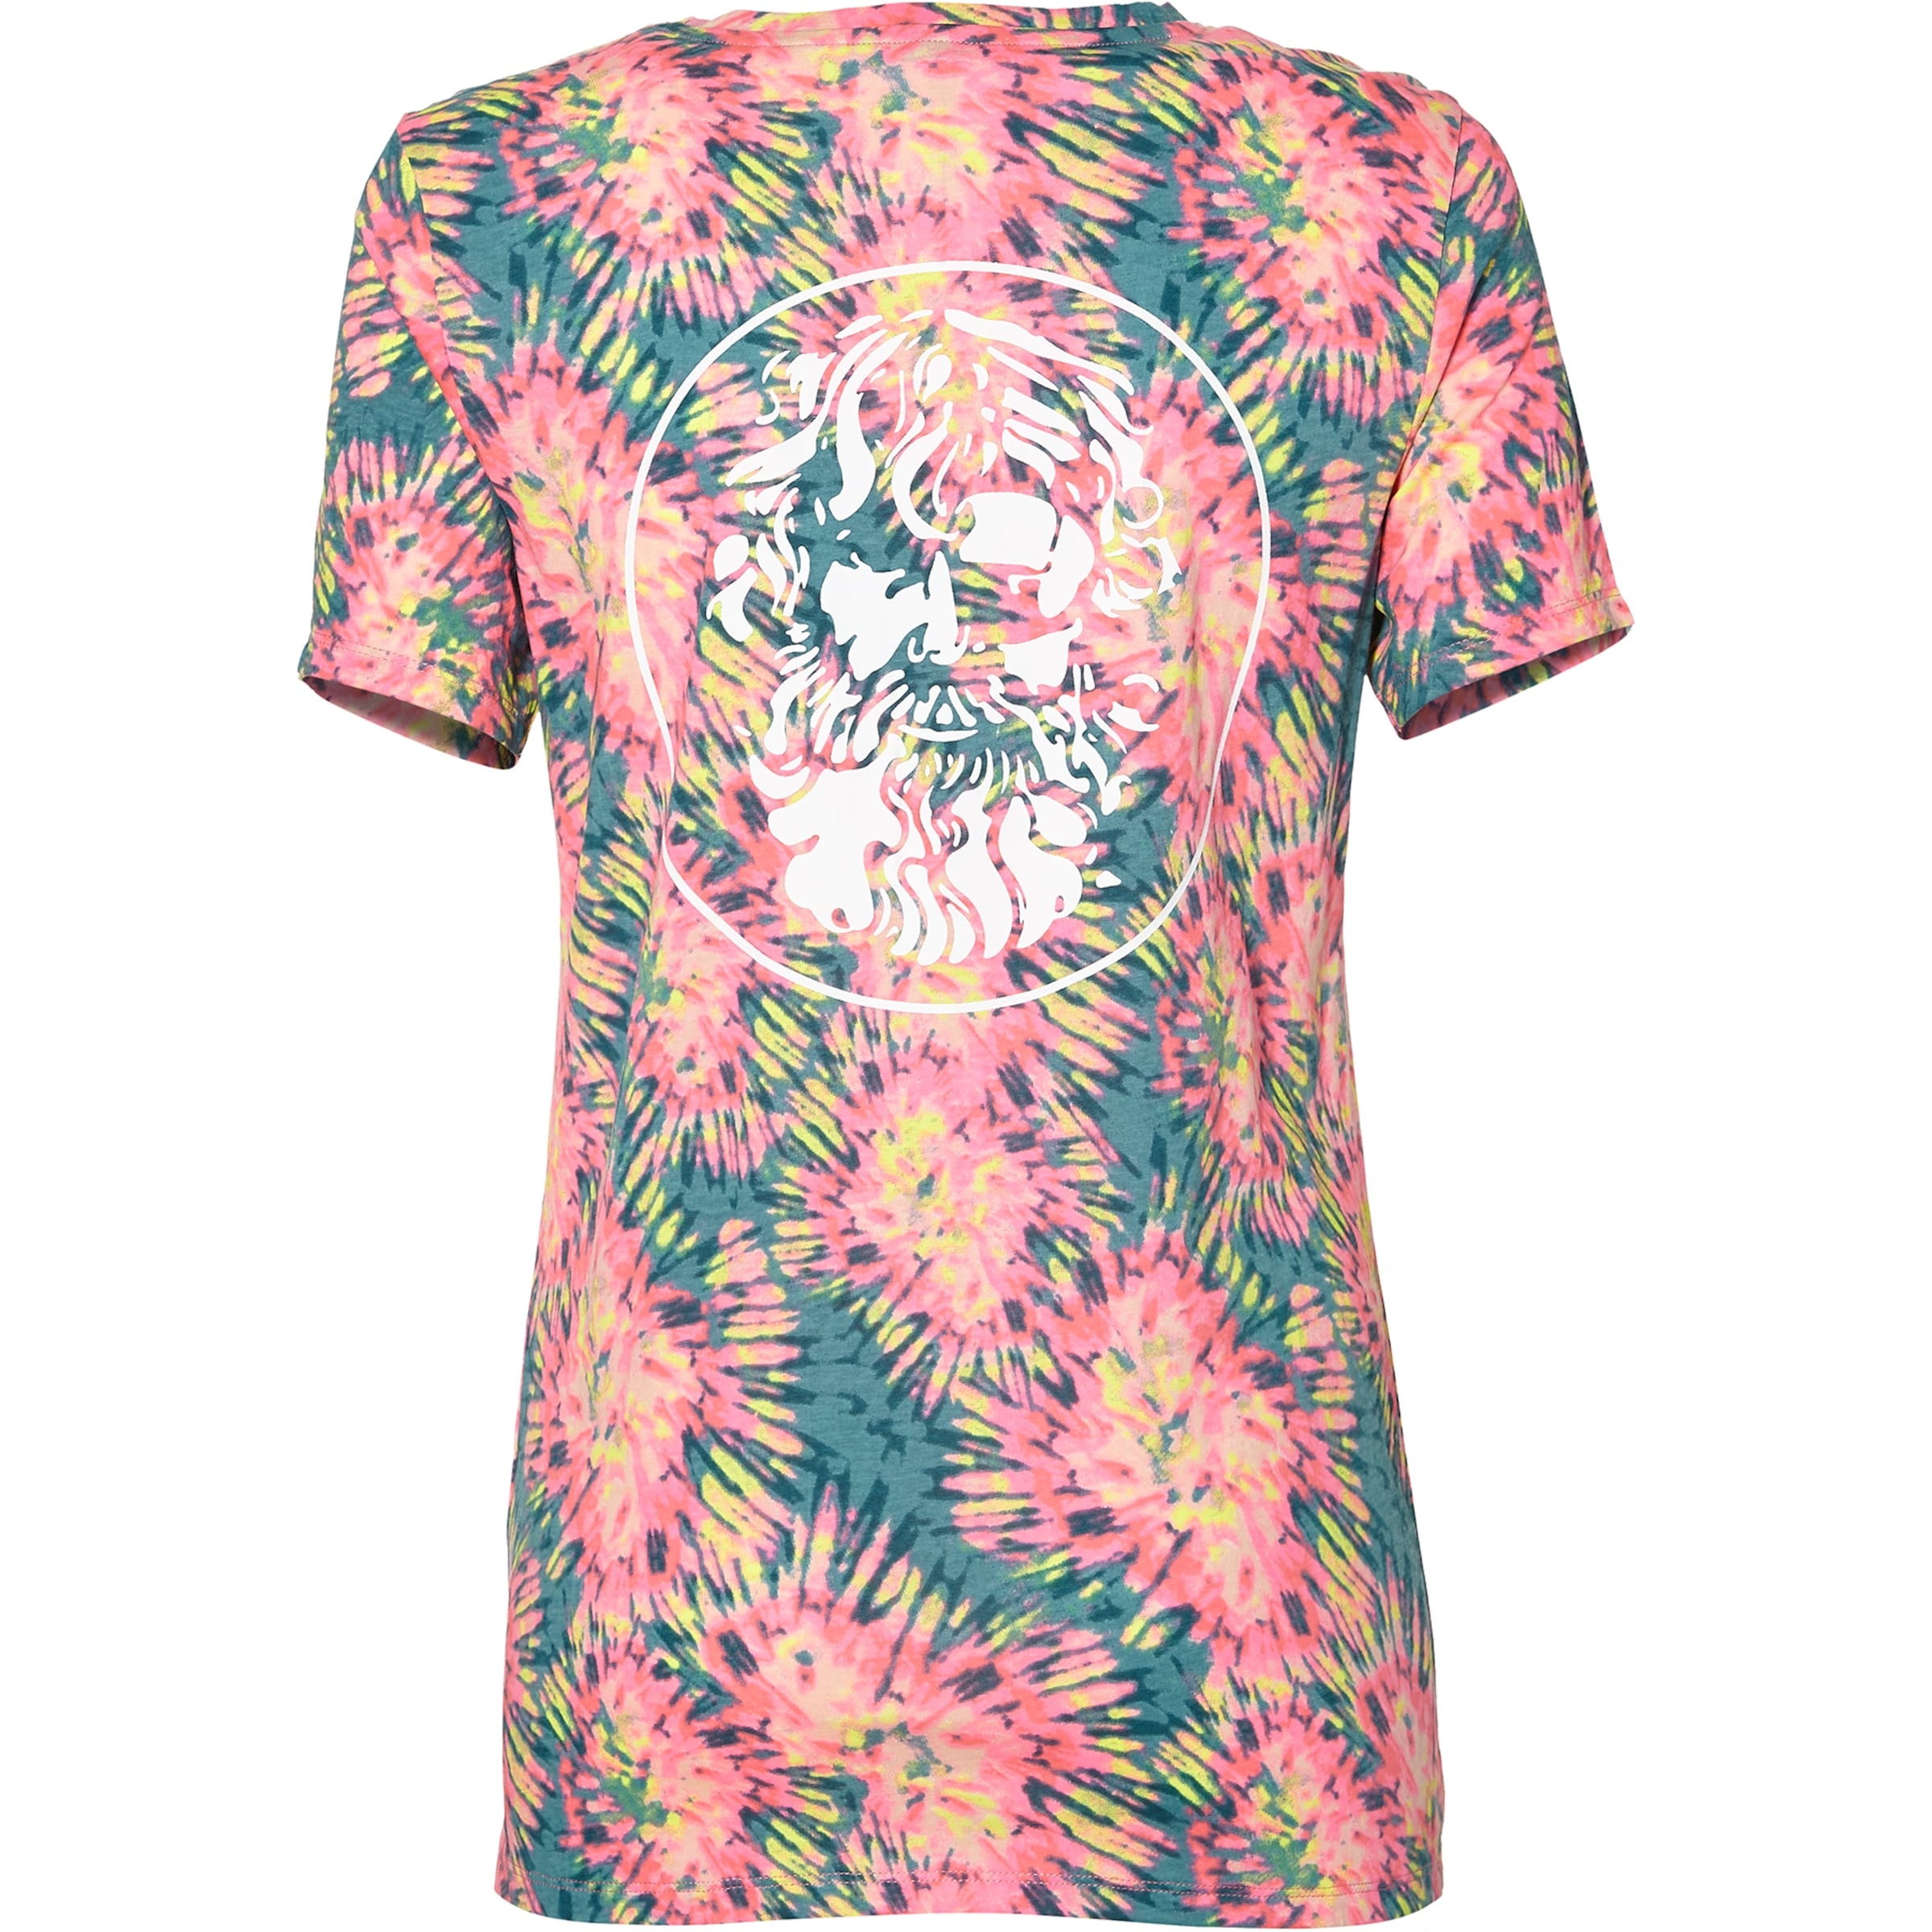 Re In T T 'lw TürkisRosa issue shirt' O'neill shirt 0wnk8OP